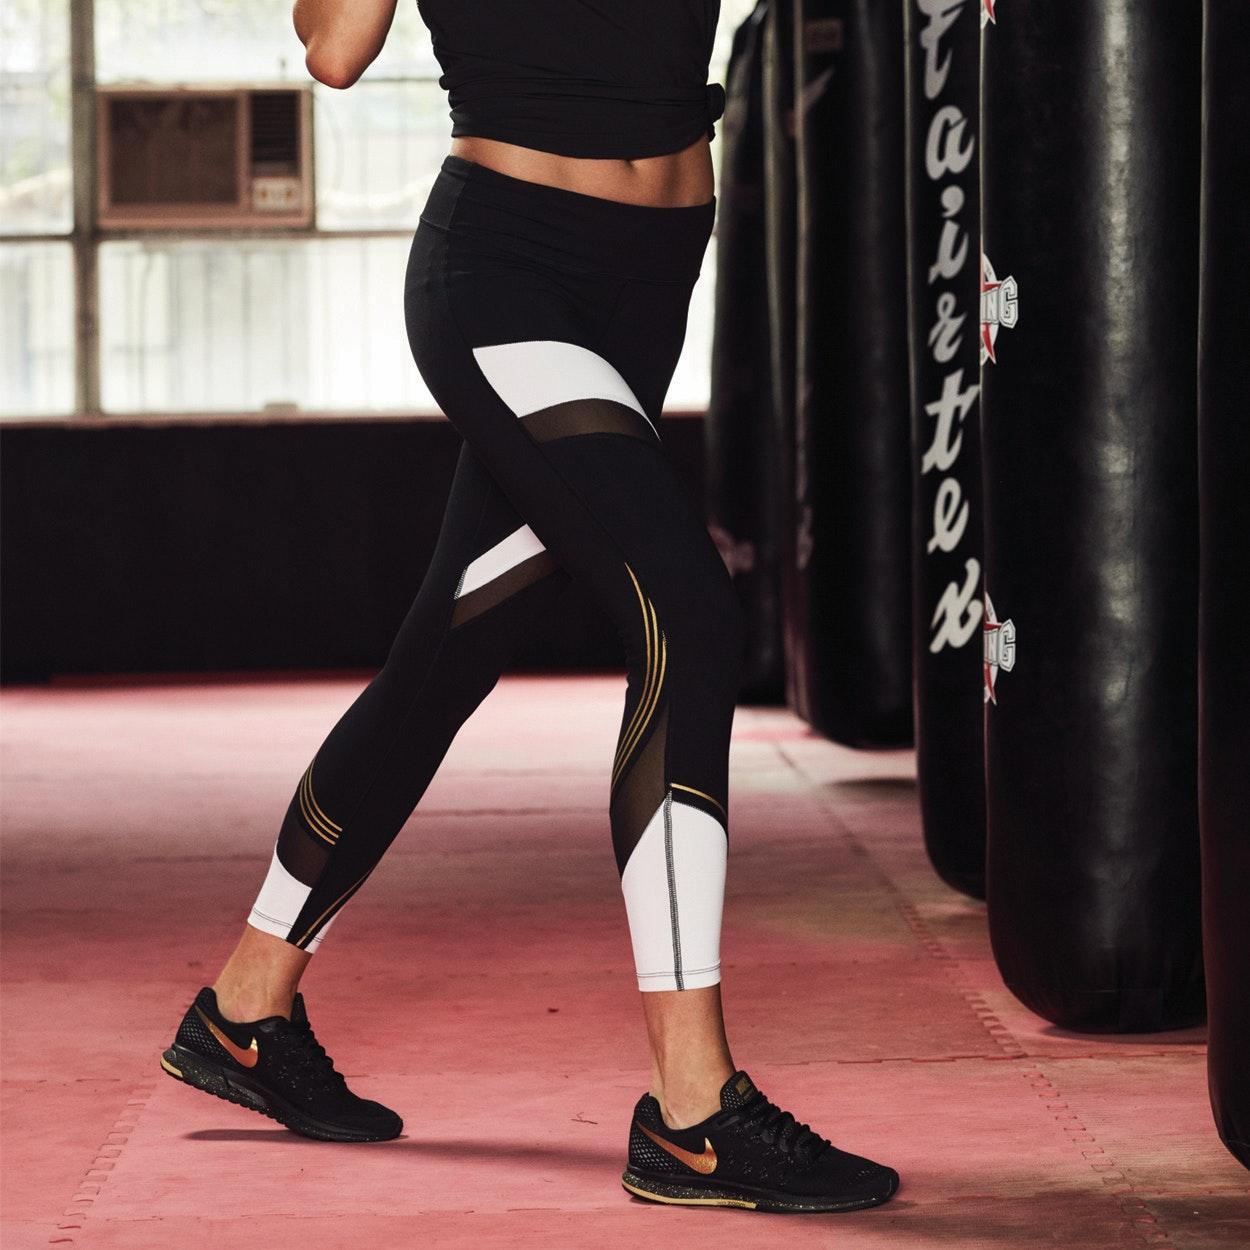 Get 2 for $100 - Women's Rockwear Tights